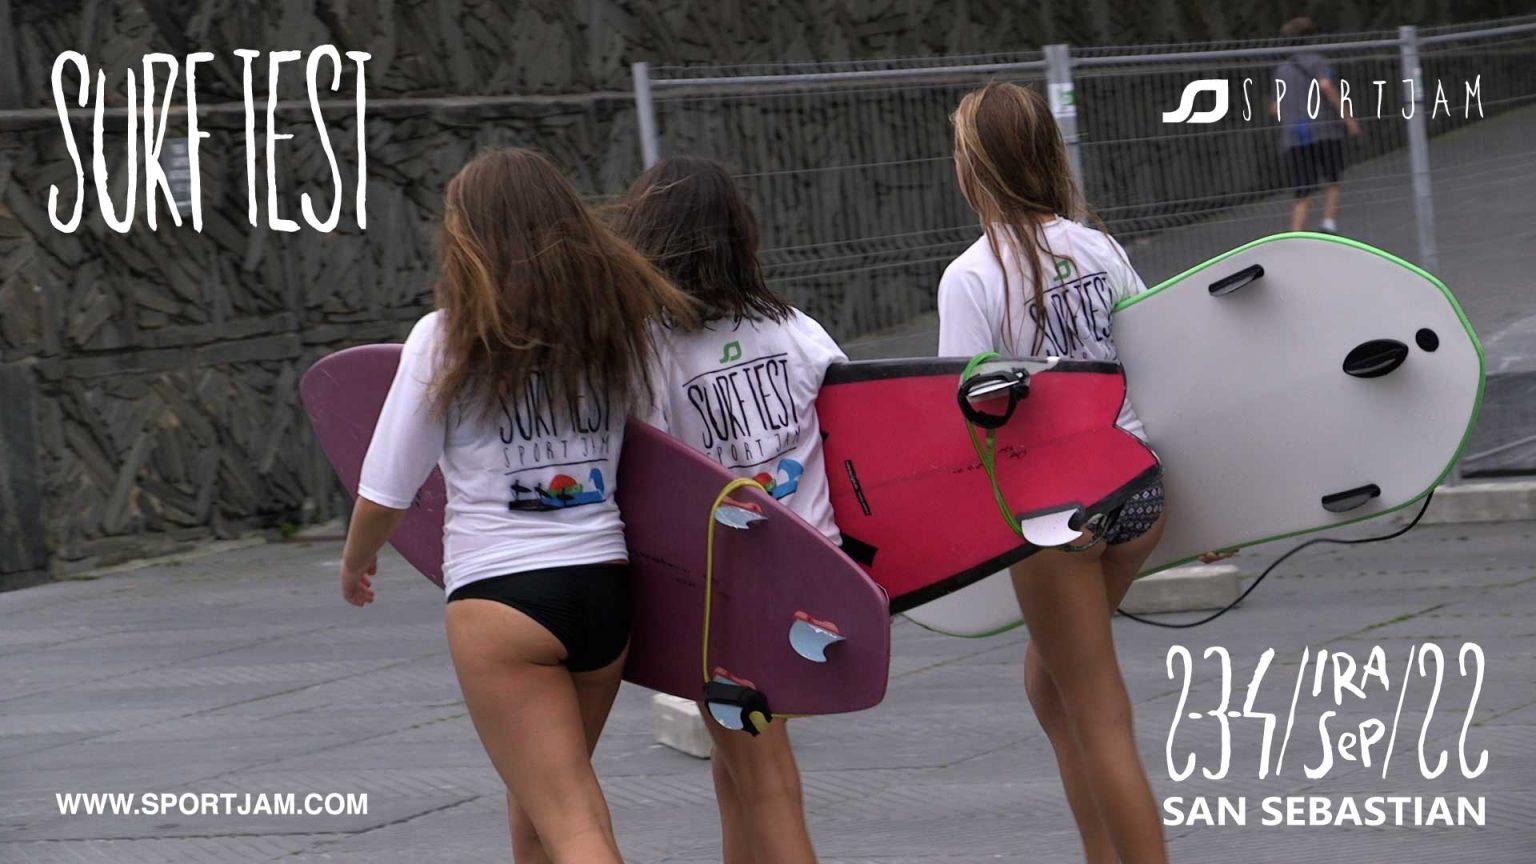 CHICAS-SURF-SPORTJAM-SURFTEST-2021